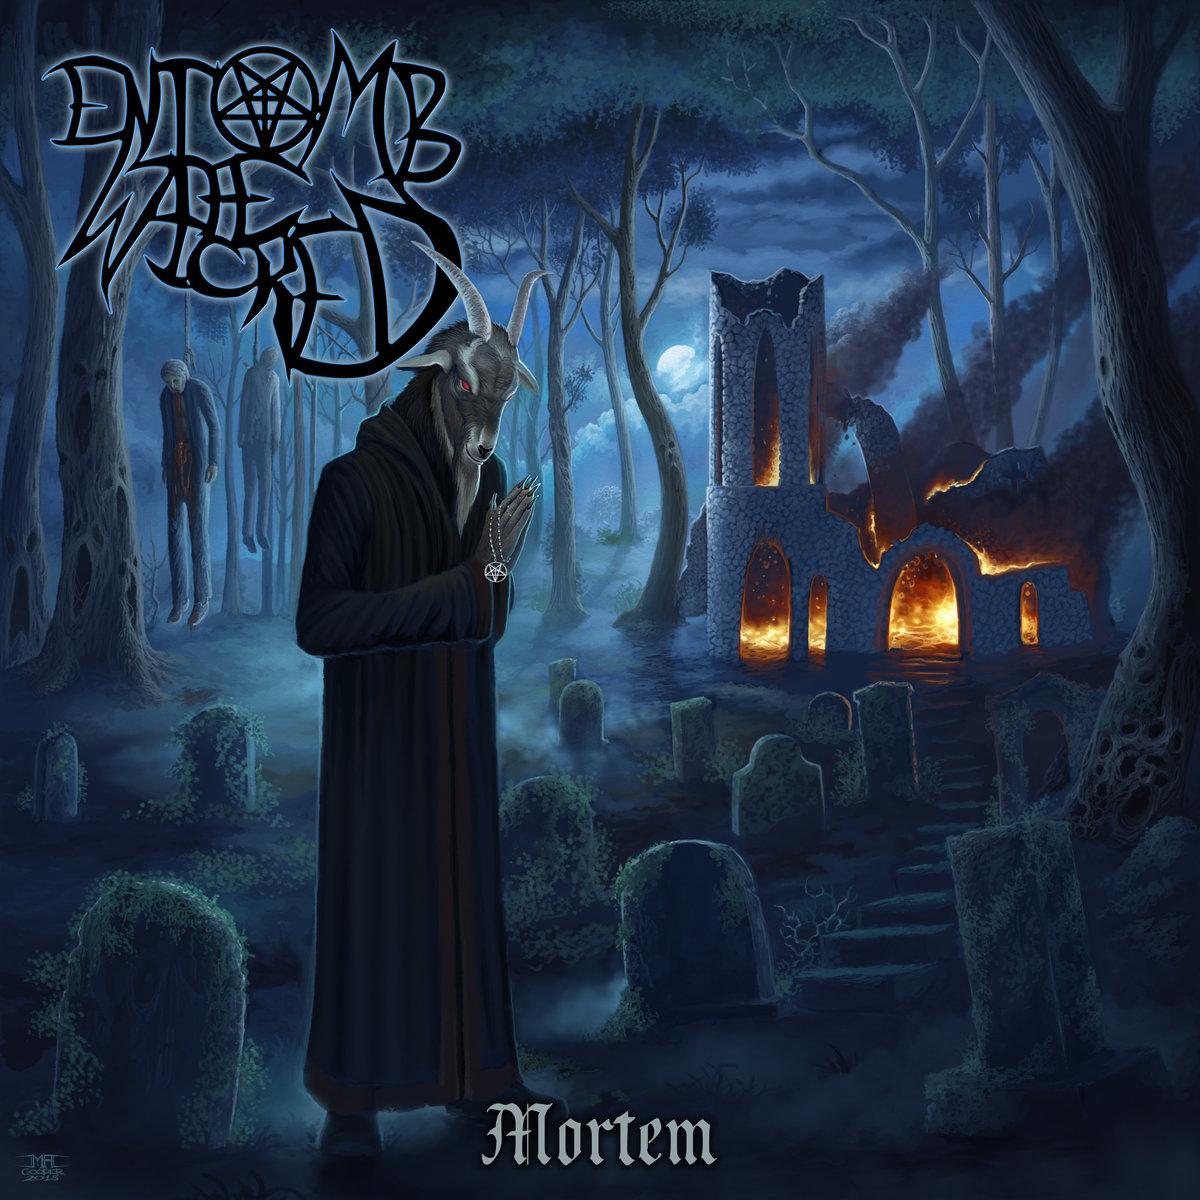 Entomb the Wicked – Mortem